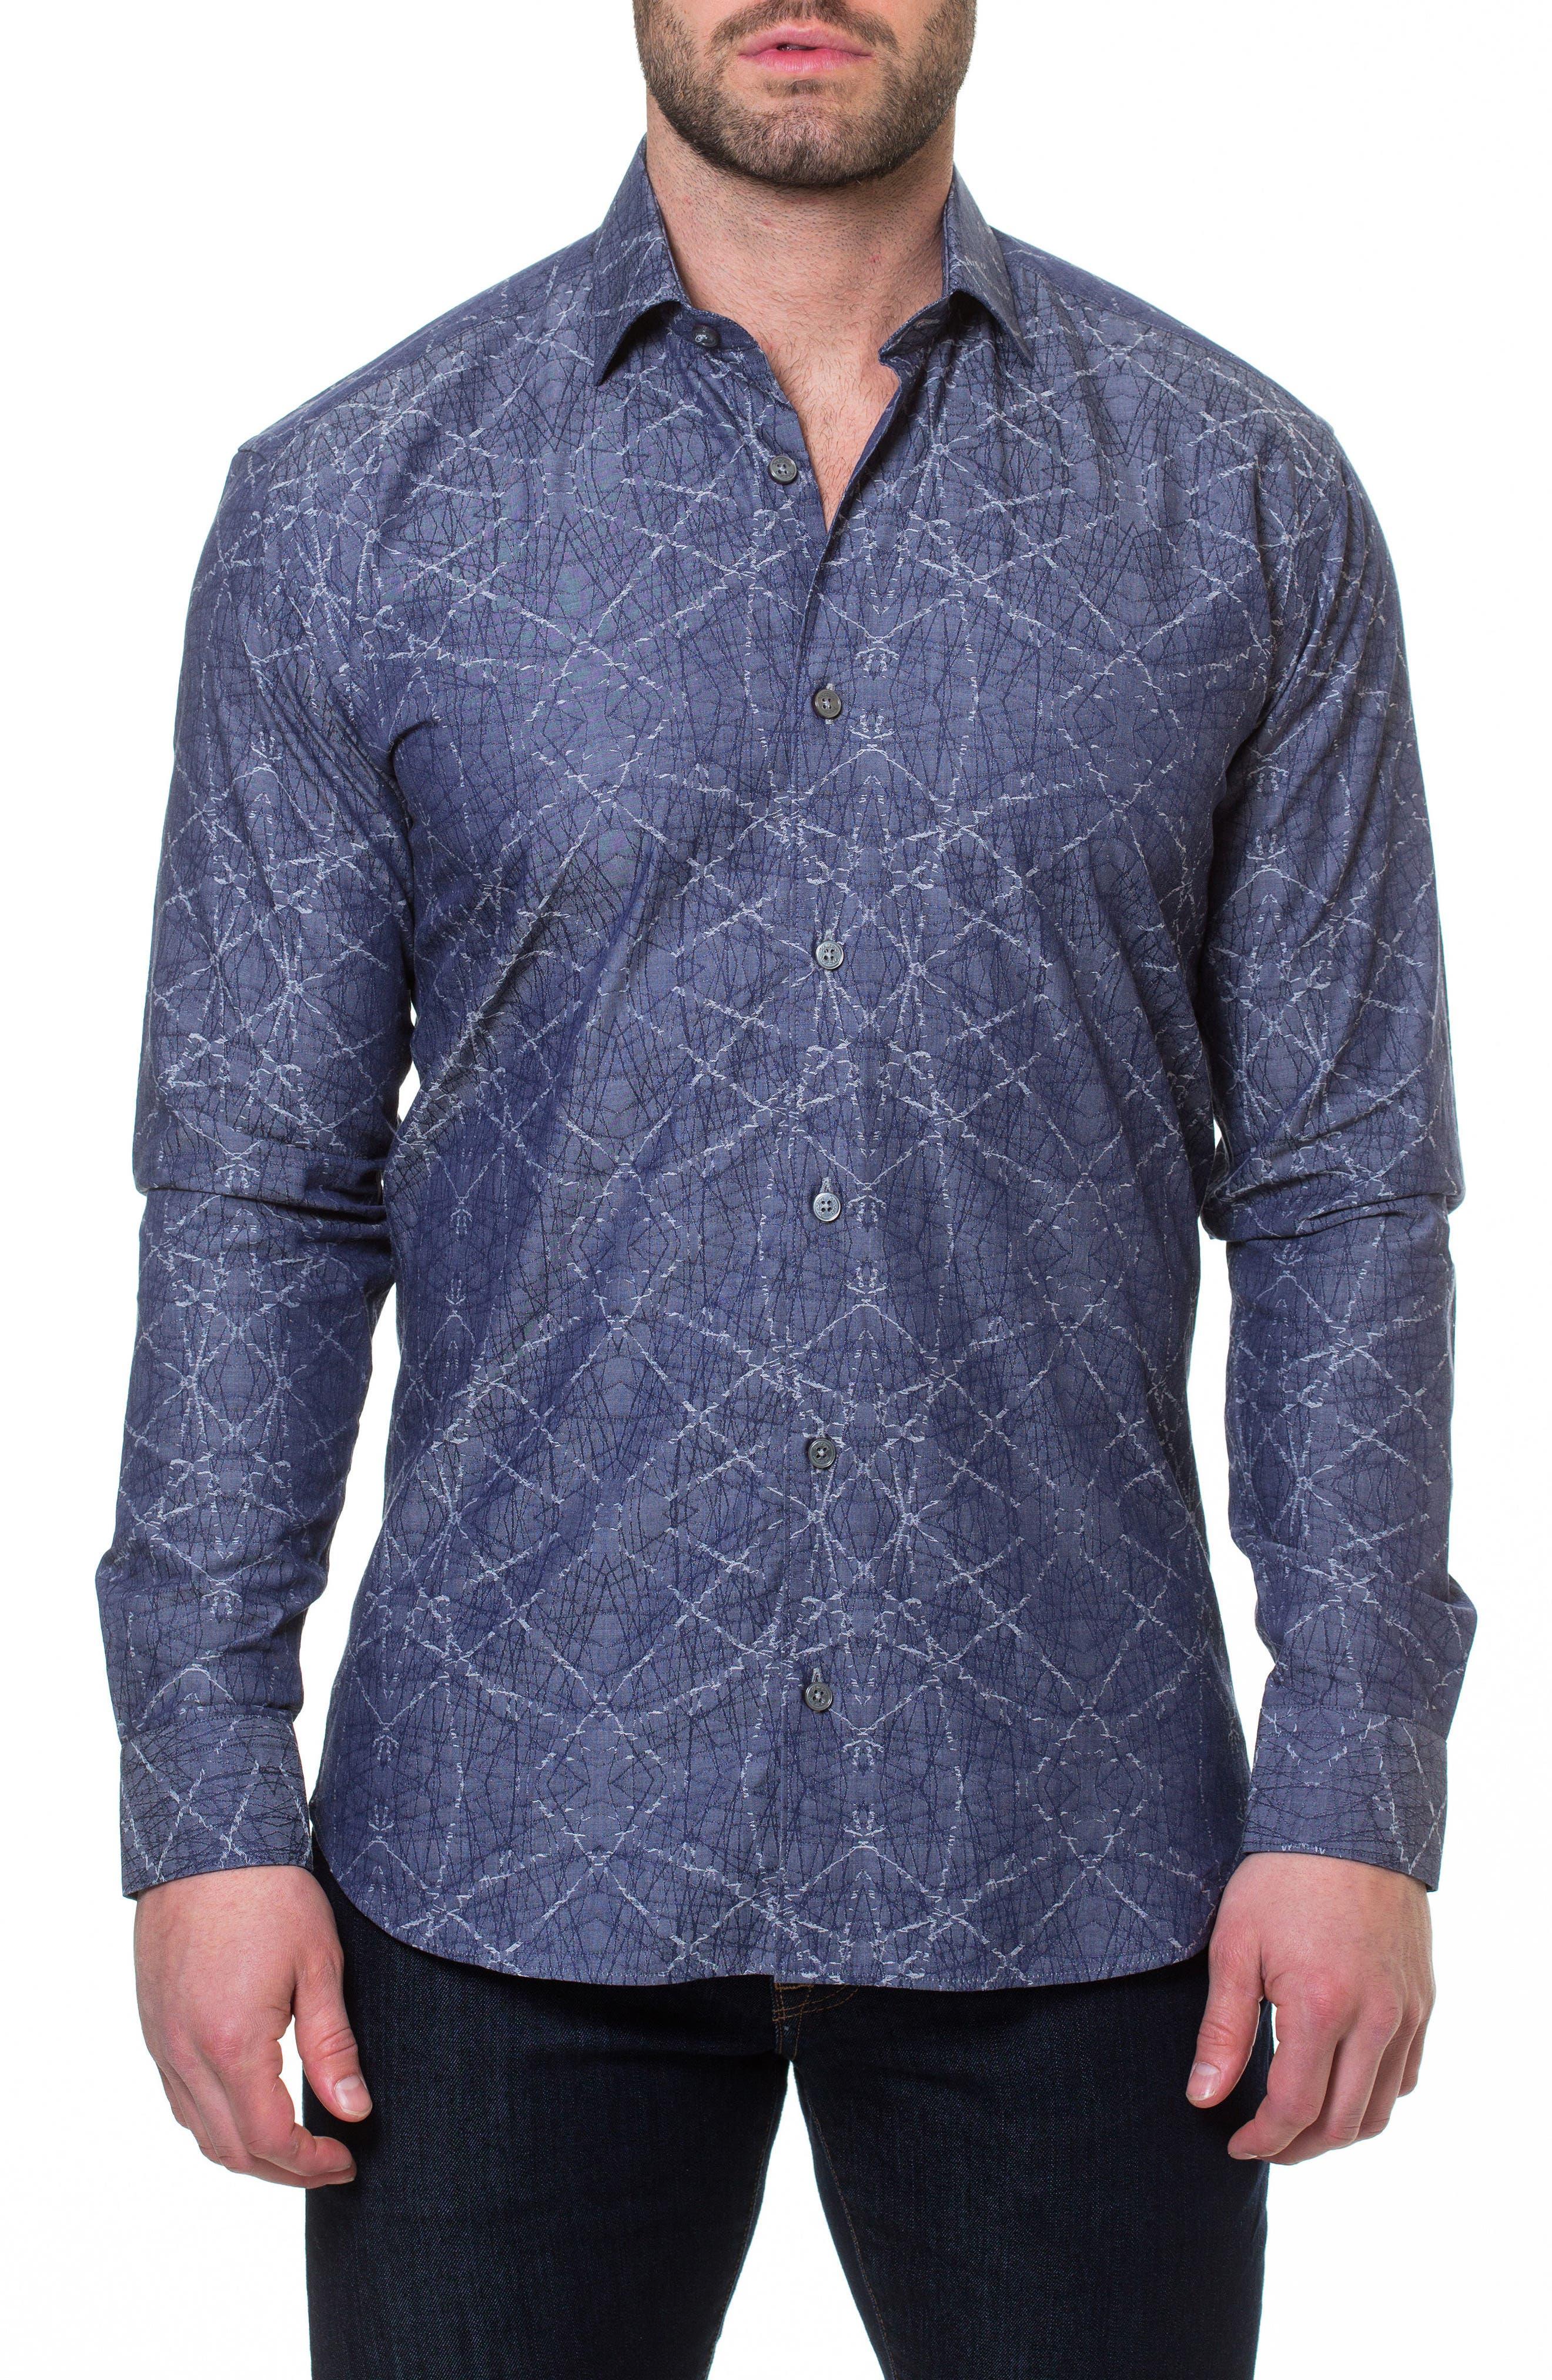 Luxor Spider Slim Fit Sport Shirt,                             Main thumbnail 1, color,                             Blue